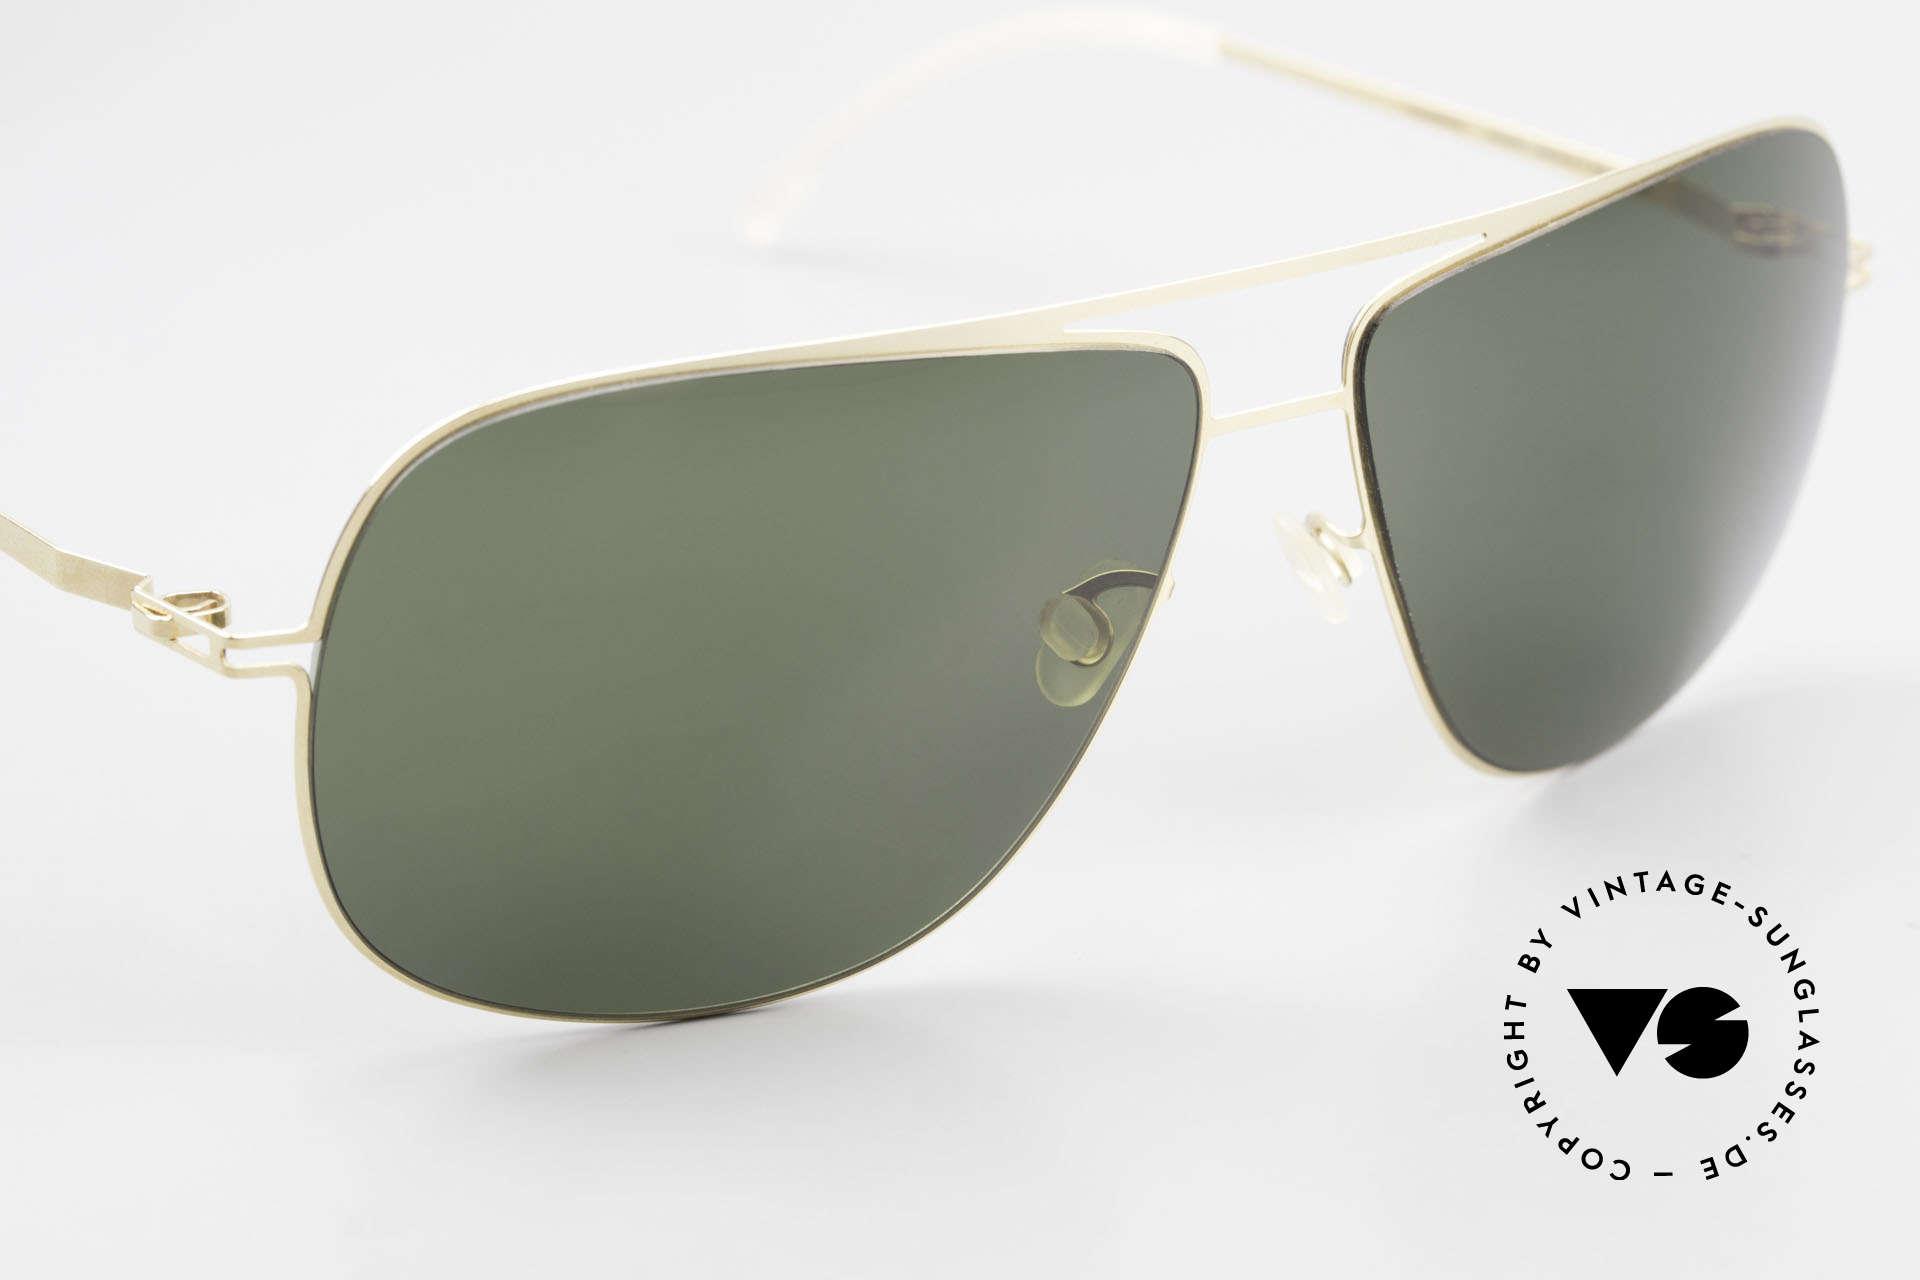 Mykita Jon Designer Lite Metal Sunglasses, top-notch quality, made in Germany (Berlin-Kreuzberg), Made for Men and Women